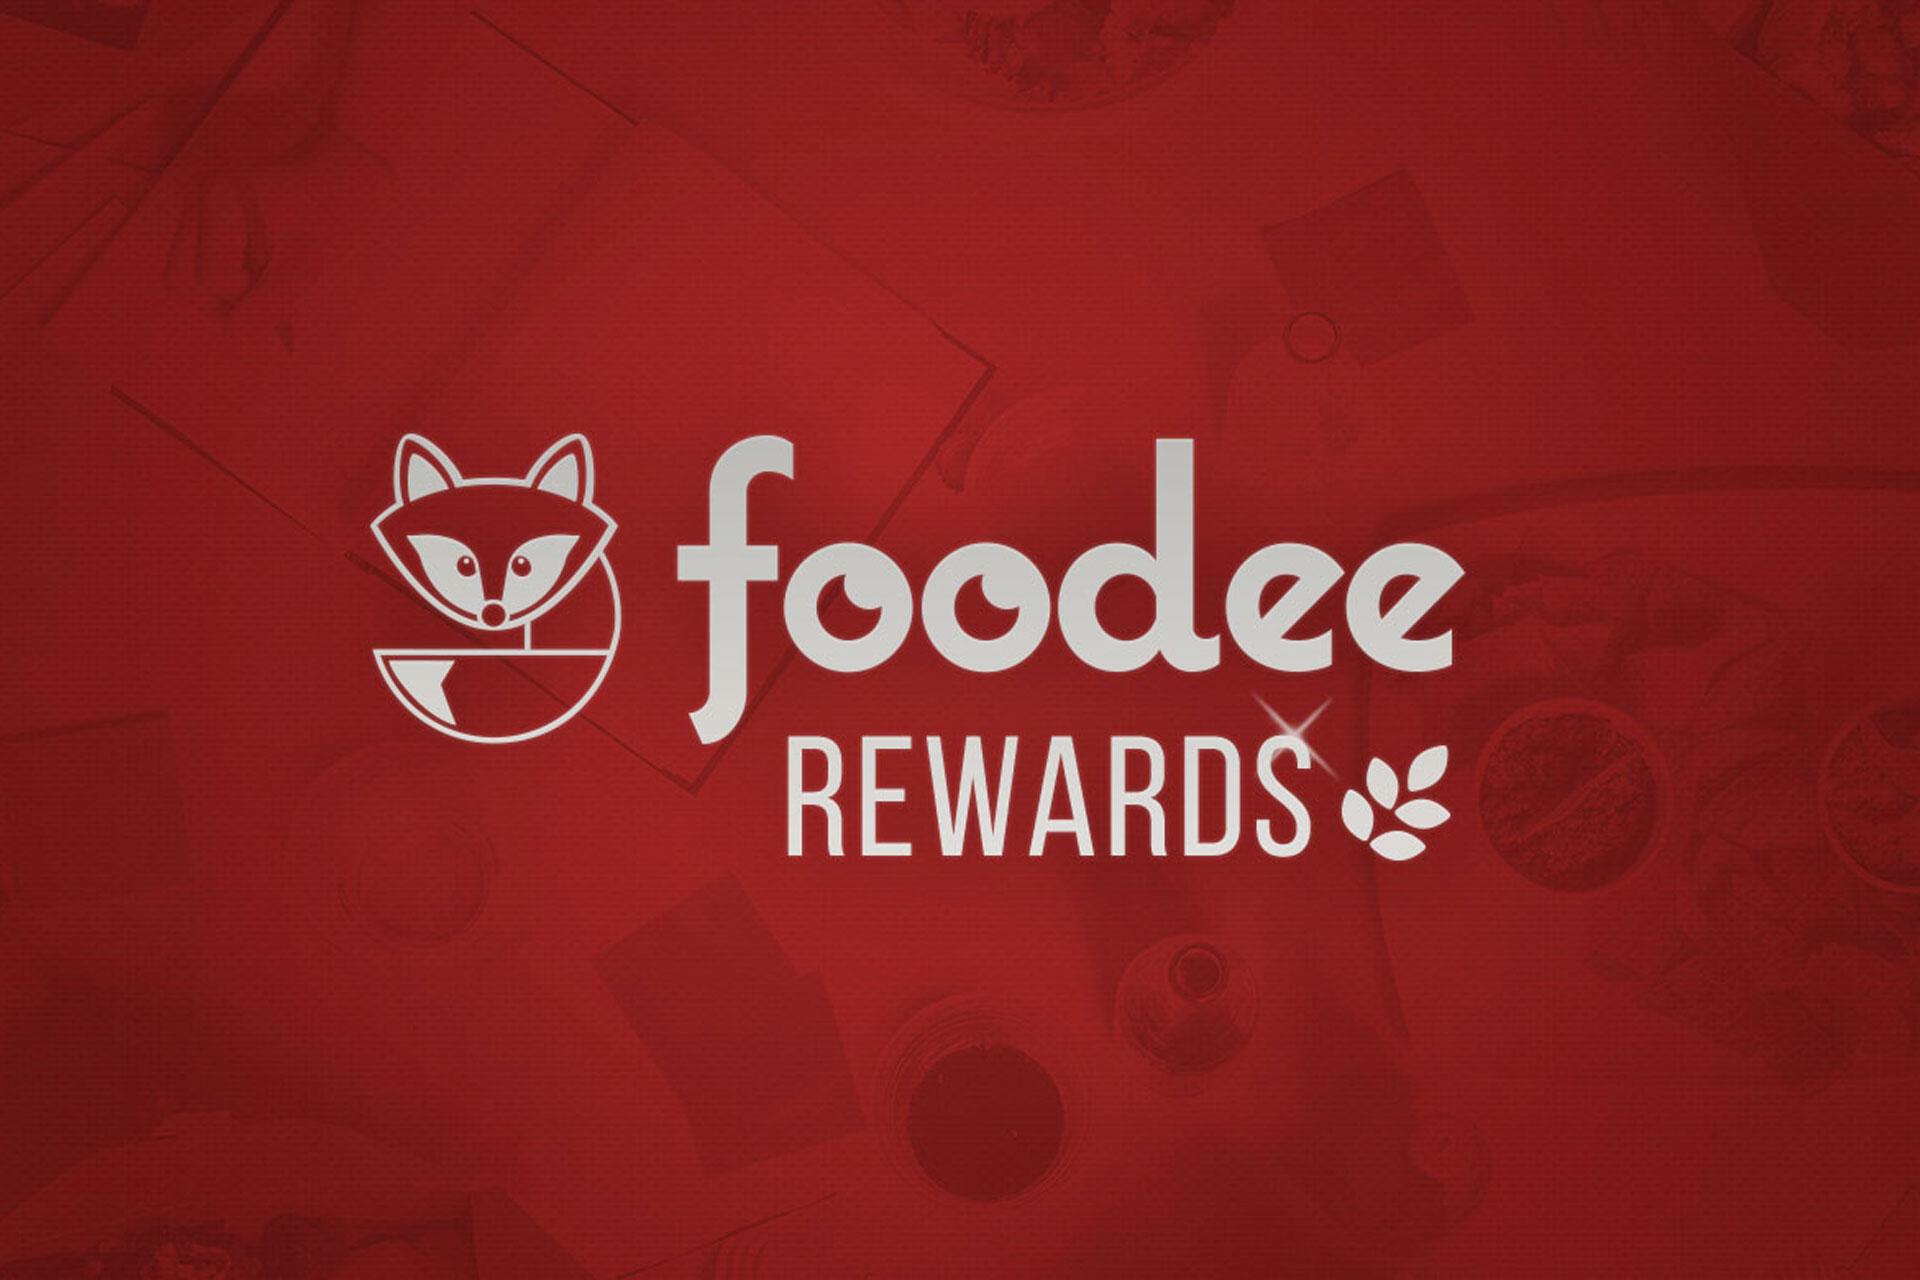 Foodee Rewards: Eat and Earn